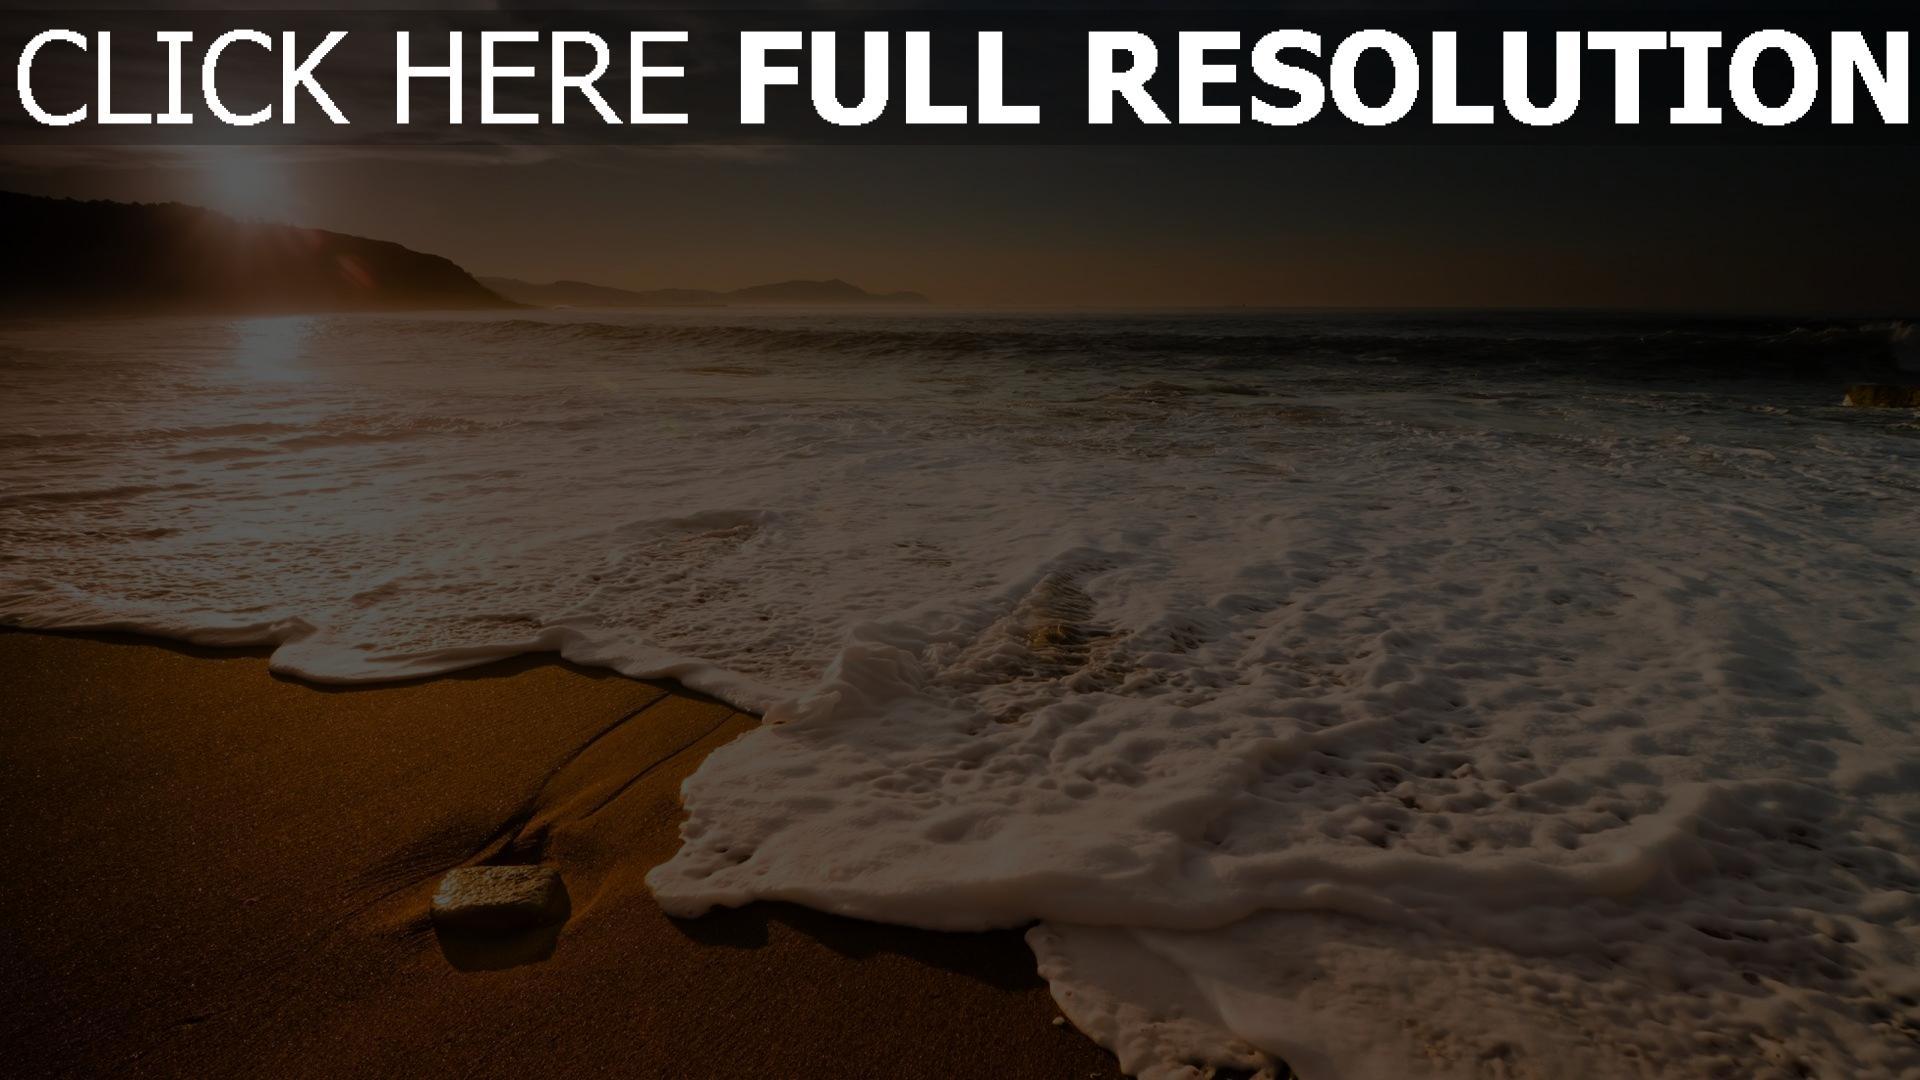 HD Hintergrundbilder morgen sonne meer sand wellen schaum ...